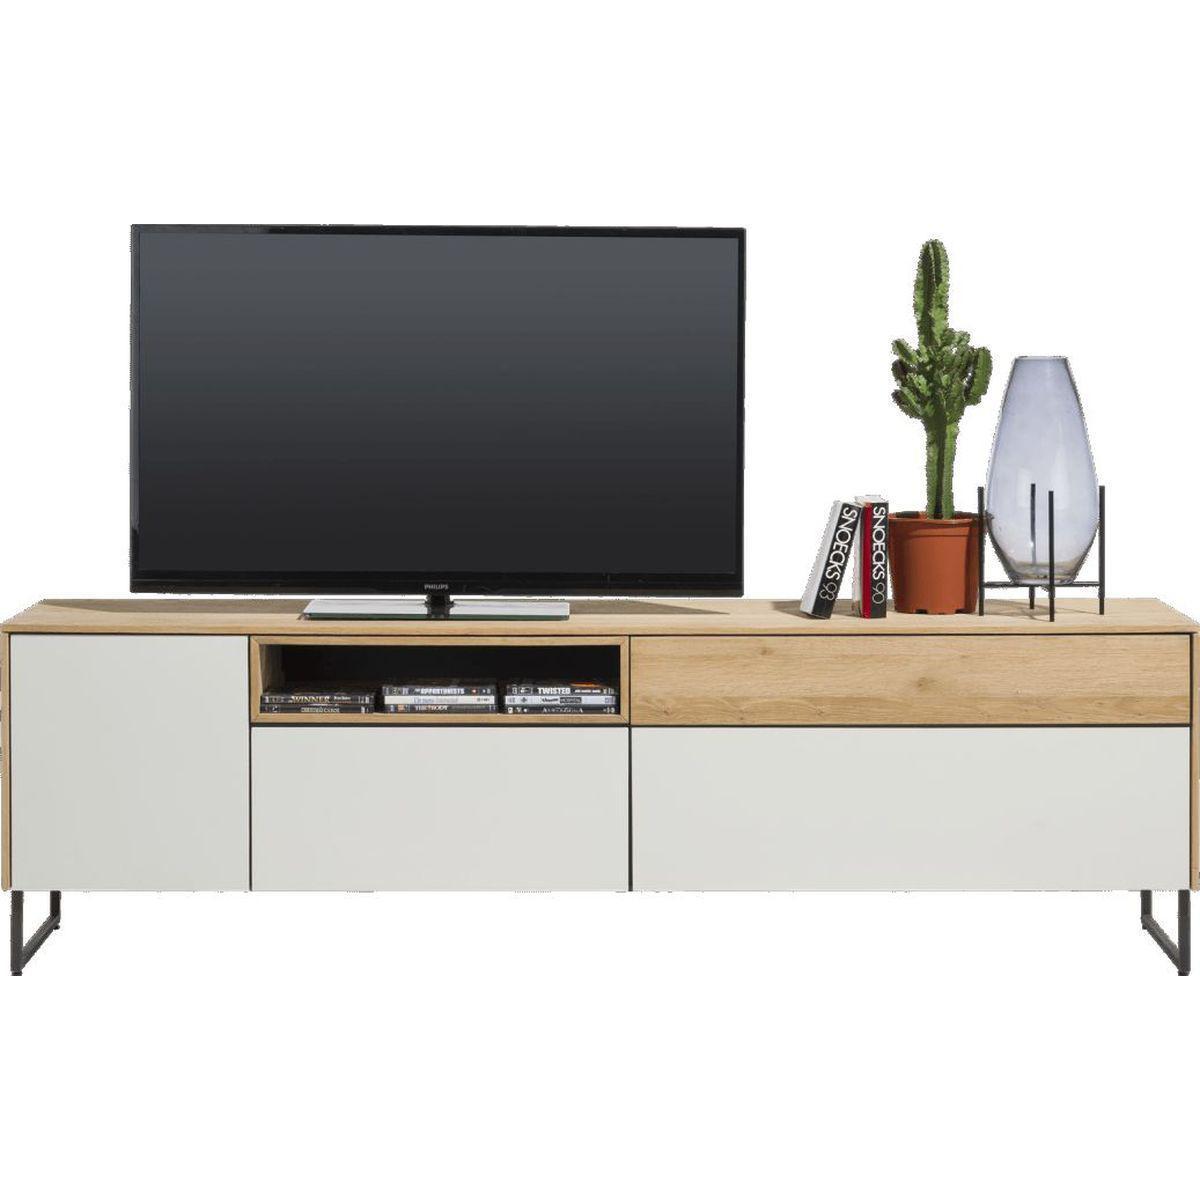 Meuble TV DARWIN XOOON 1 porte 3 tiroirs 1 niche 200 cm